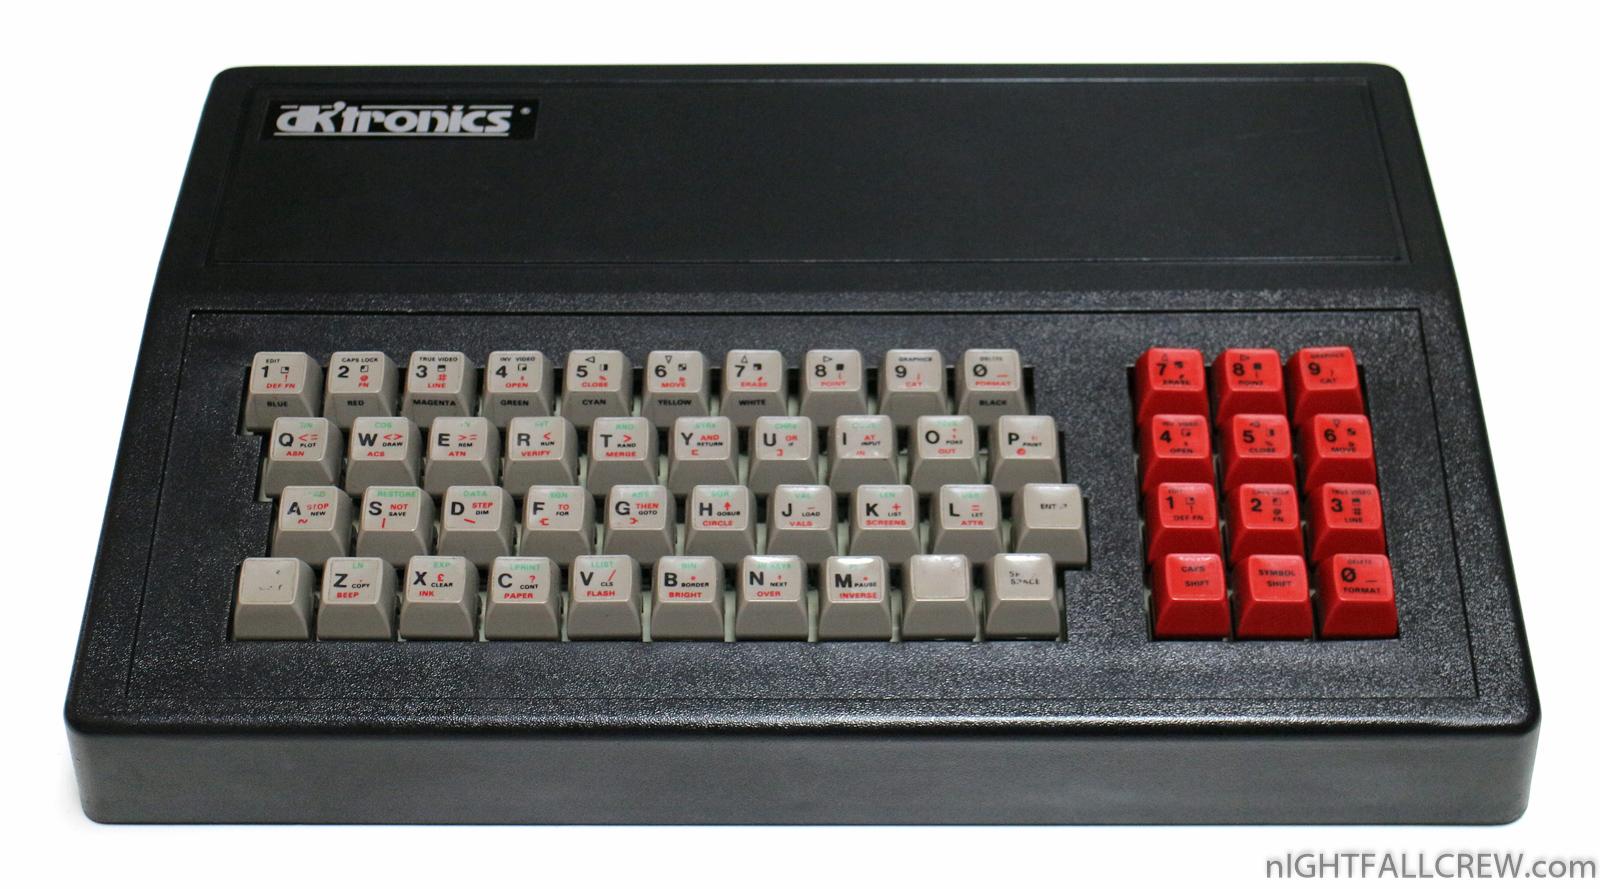 Dk Tronics Keyboard For Sinclair Zx Spectrum Nightfall